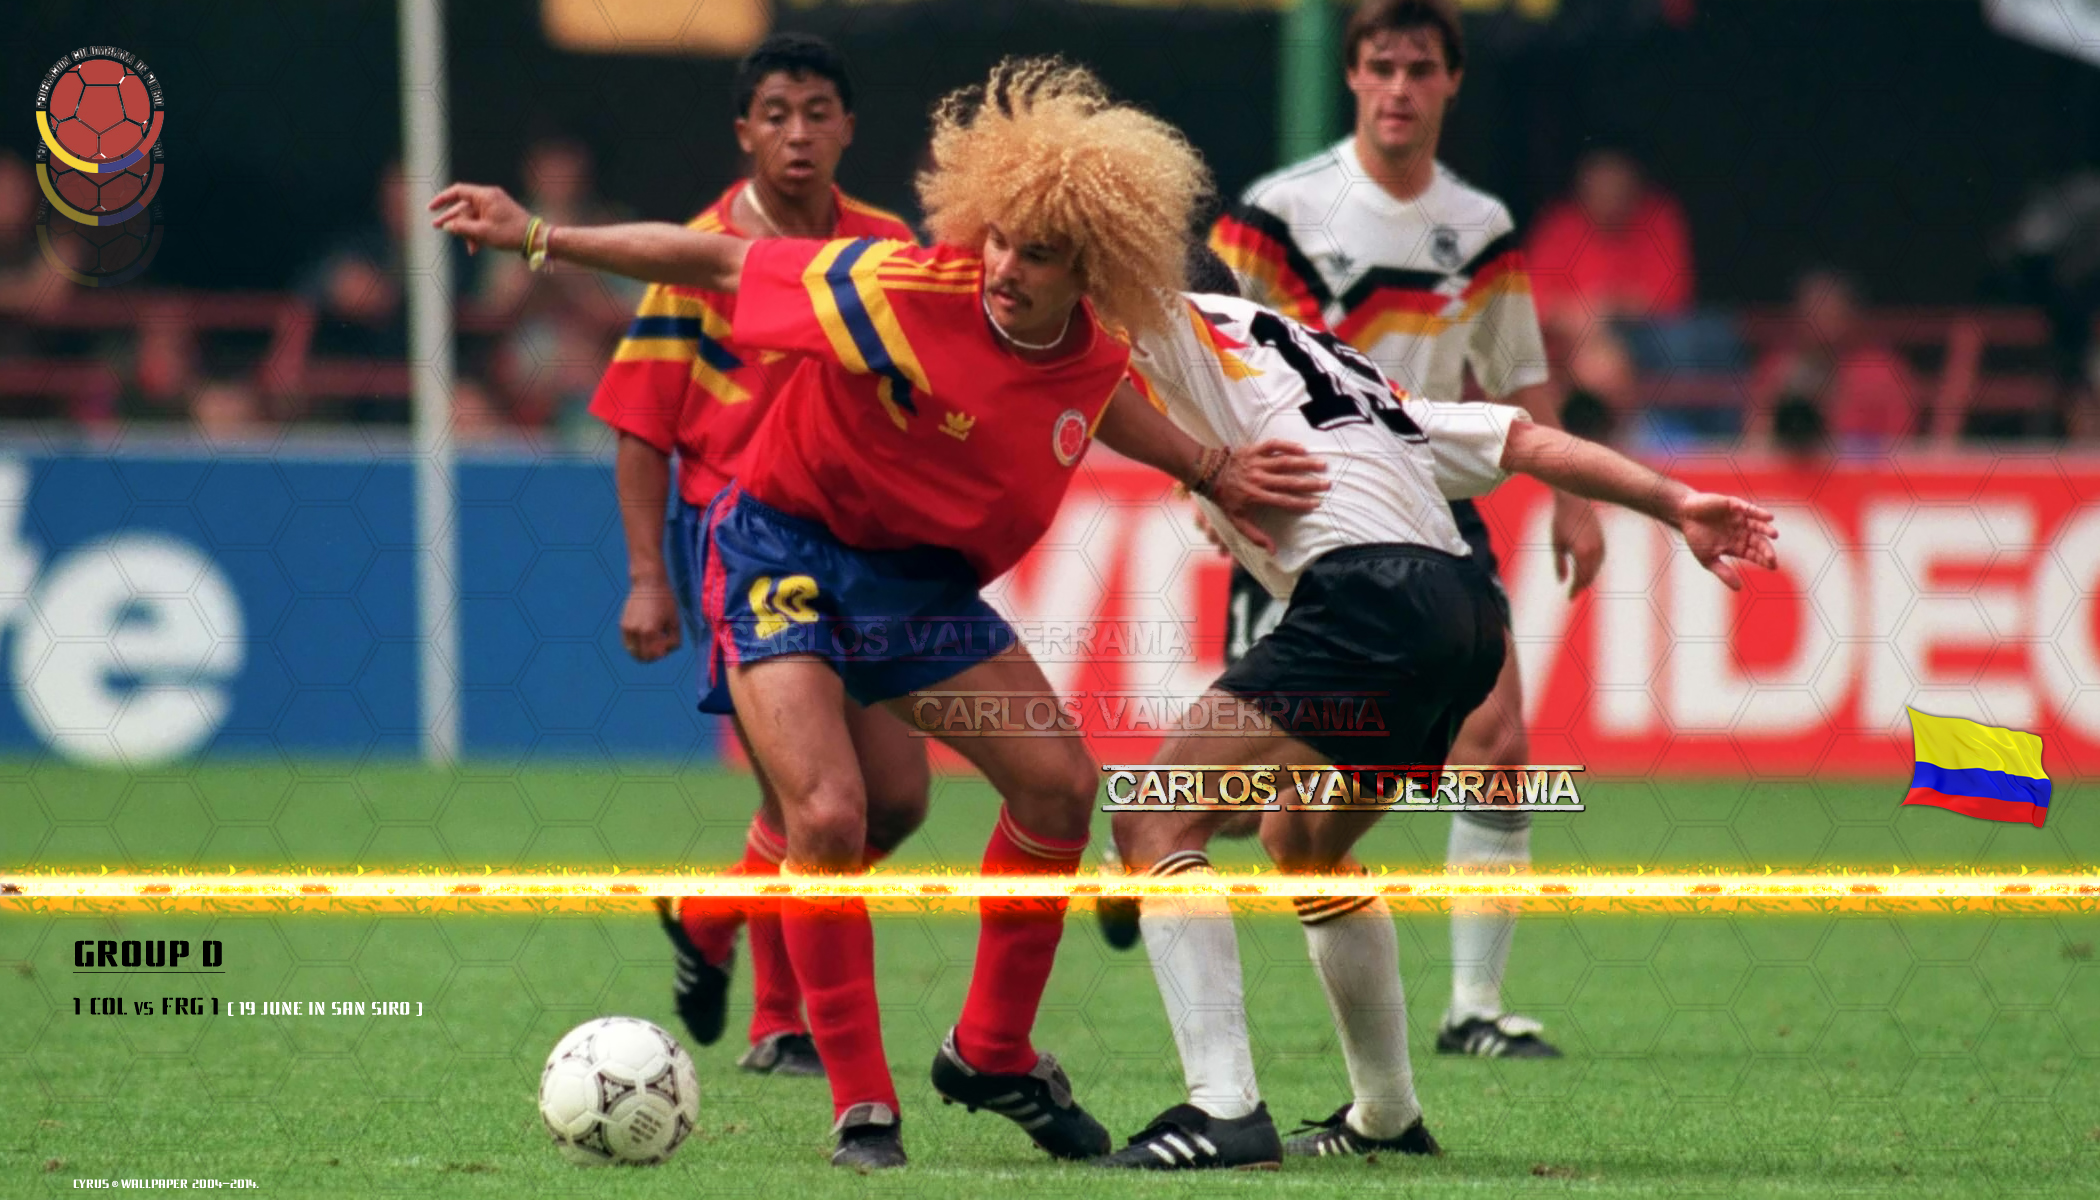 والپیپر کارلوس والدراما کلمبیا در جام جهانی 1990